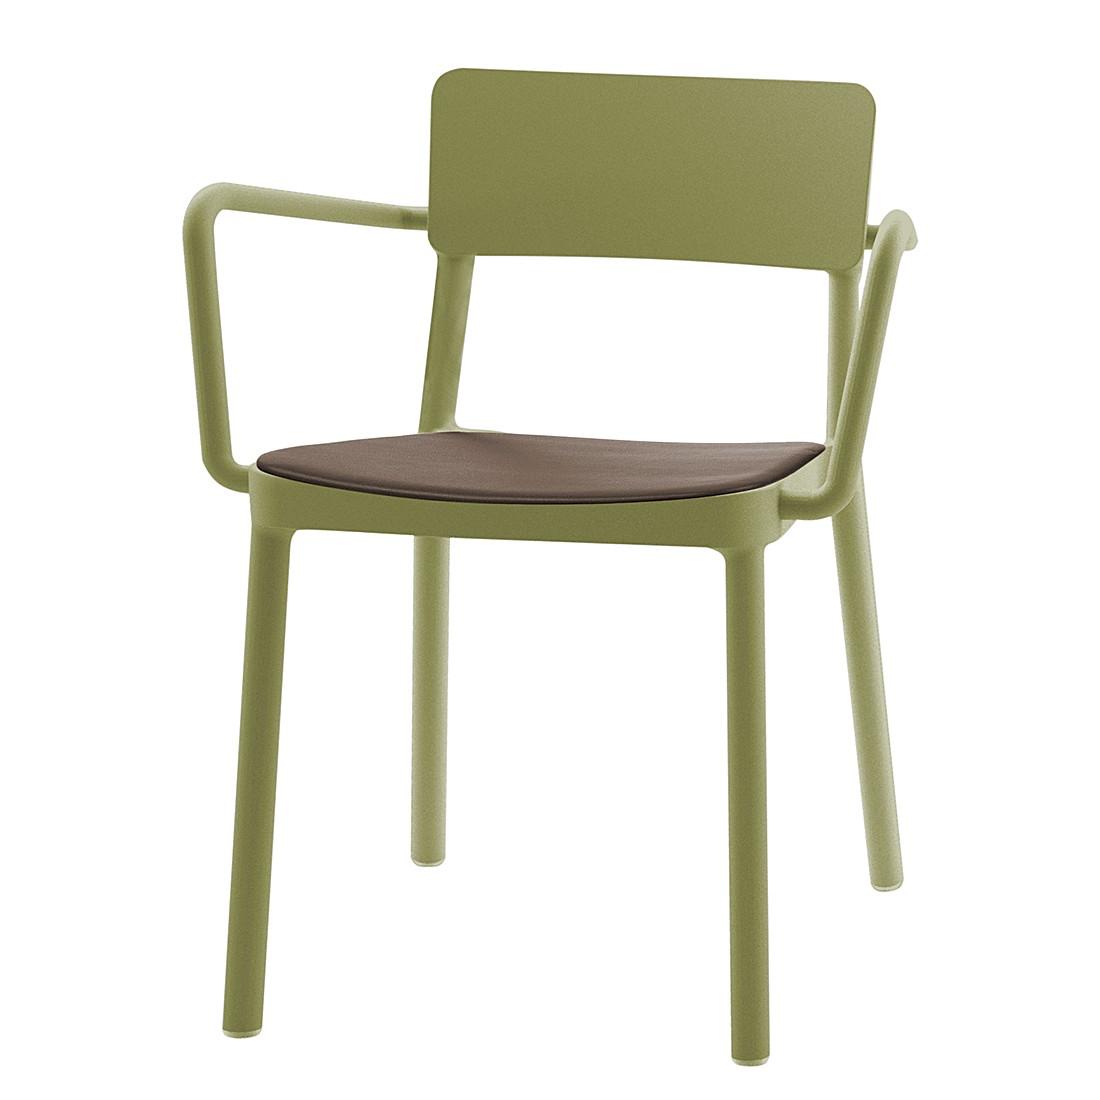 Armlehnenstuhl Lisboa (4er-Set) – Kunststoff Olivgrün/ Kunstleder Braun, Blanke Design günstig online kaufen